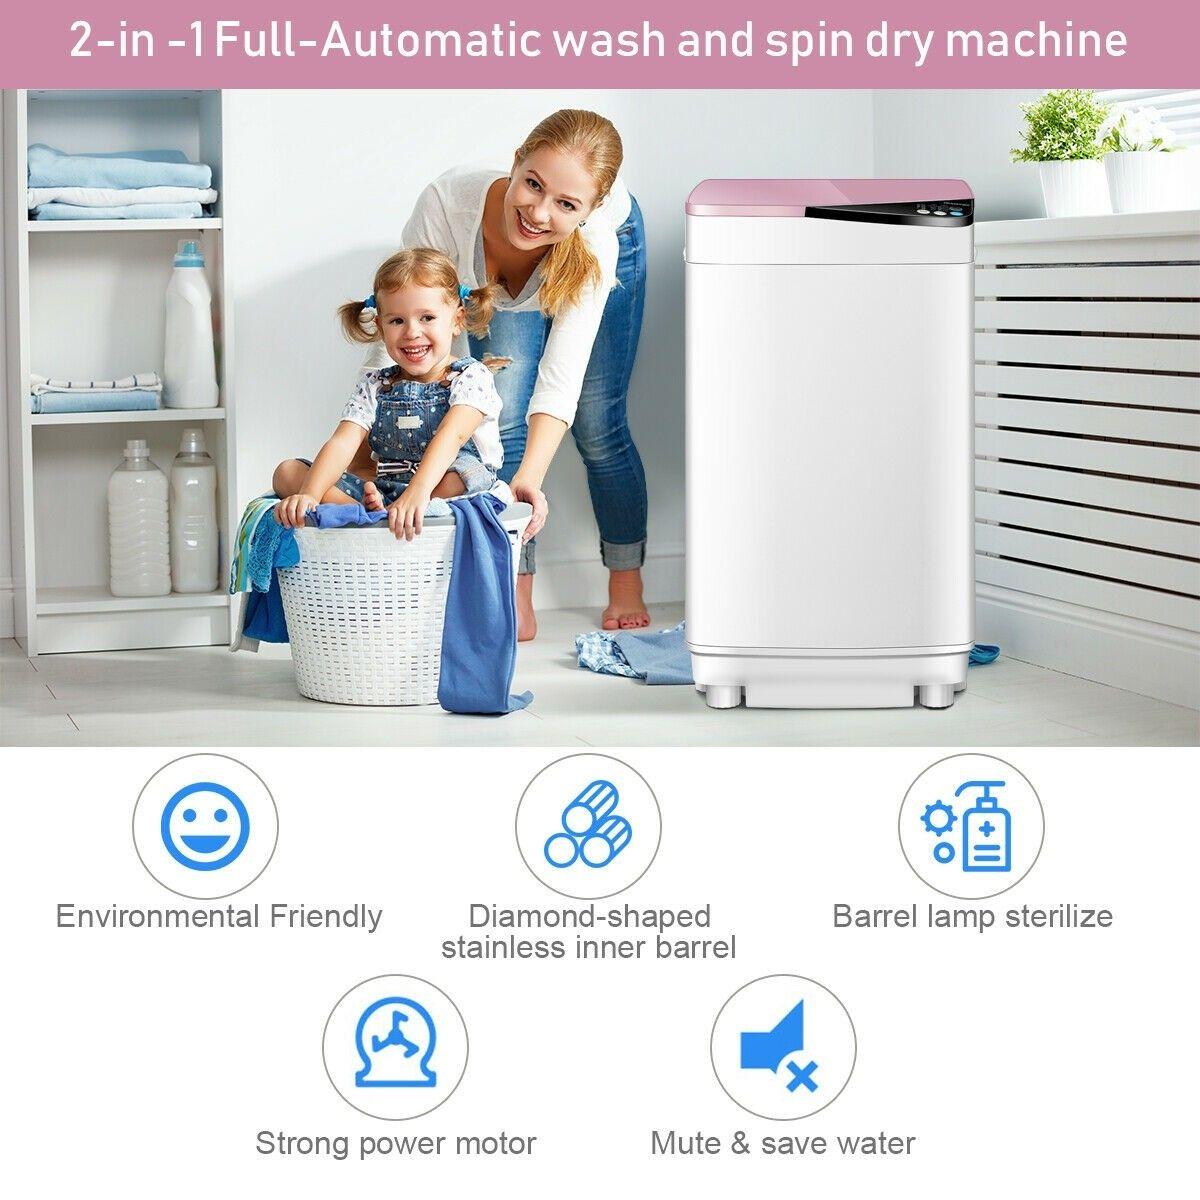 Fullautomatic washing machine 77 lbs washer spinner